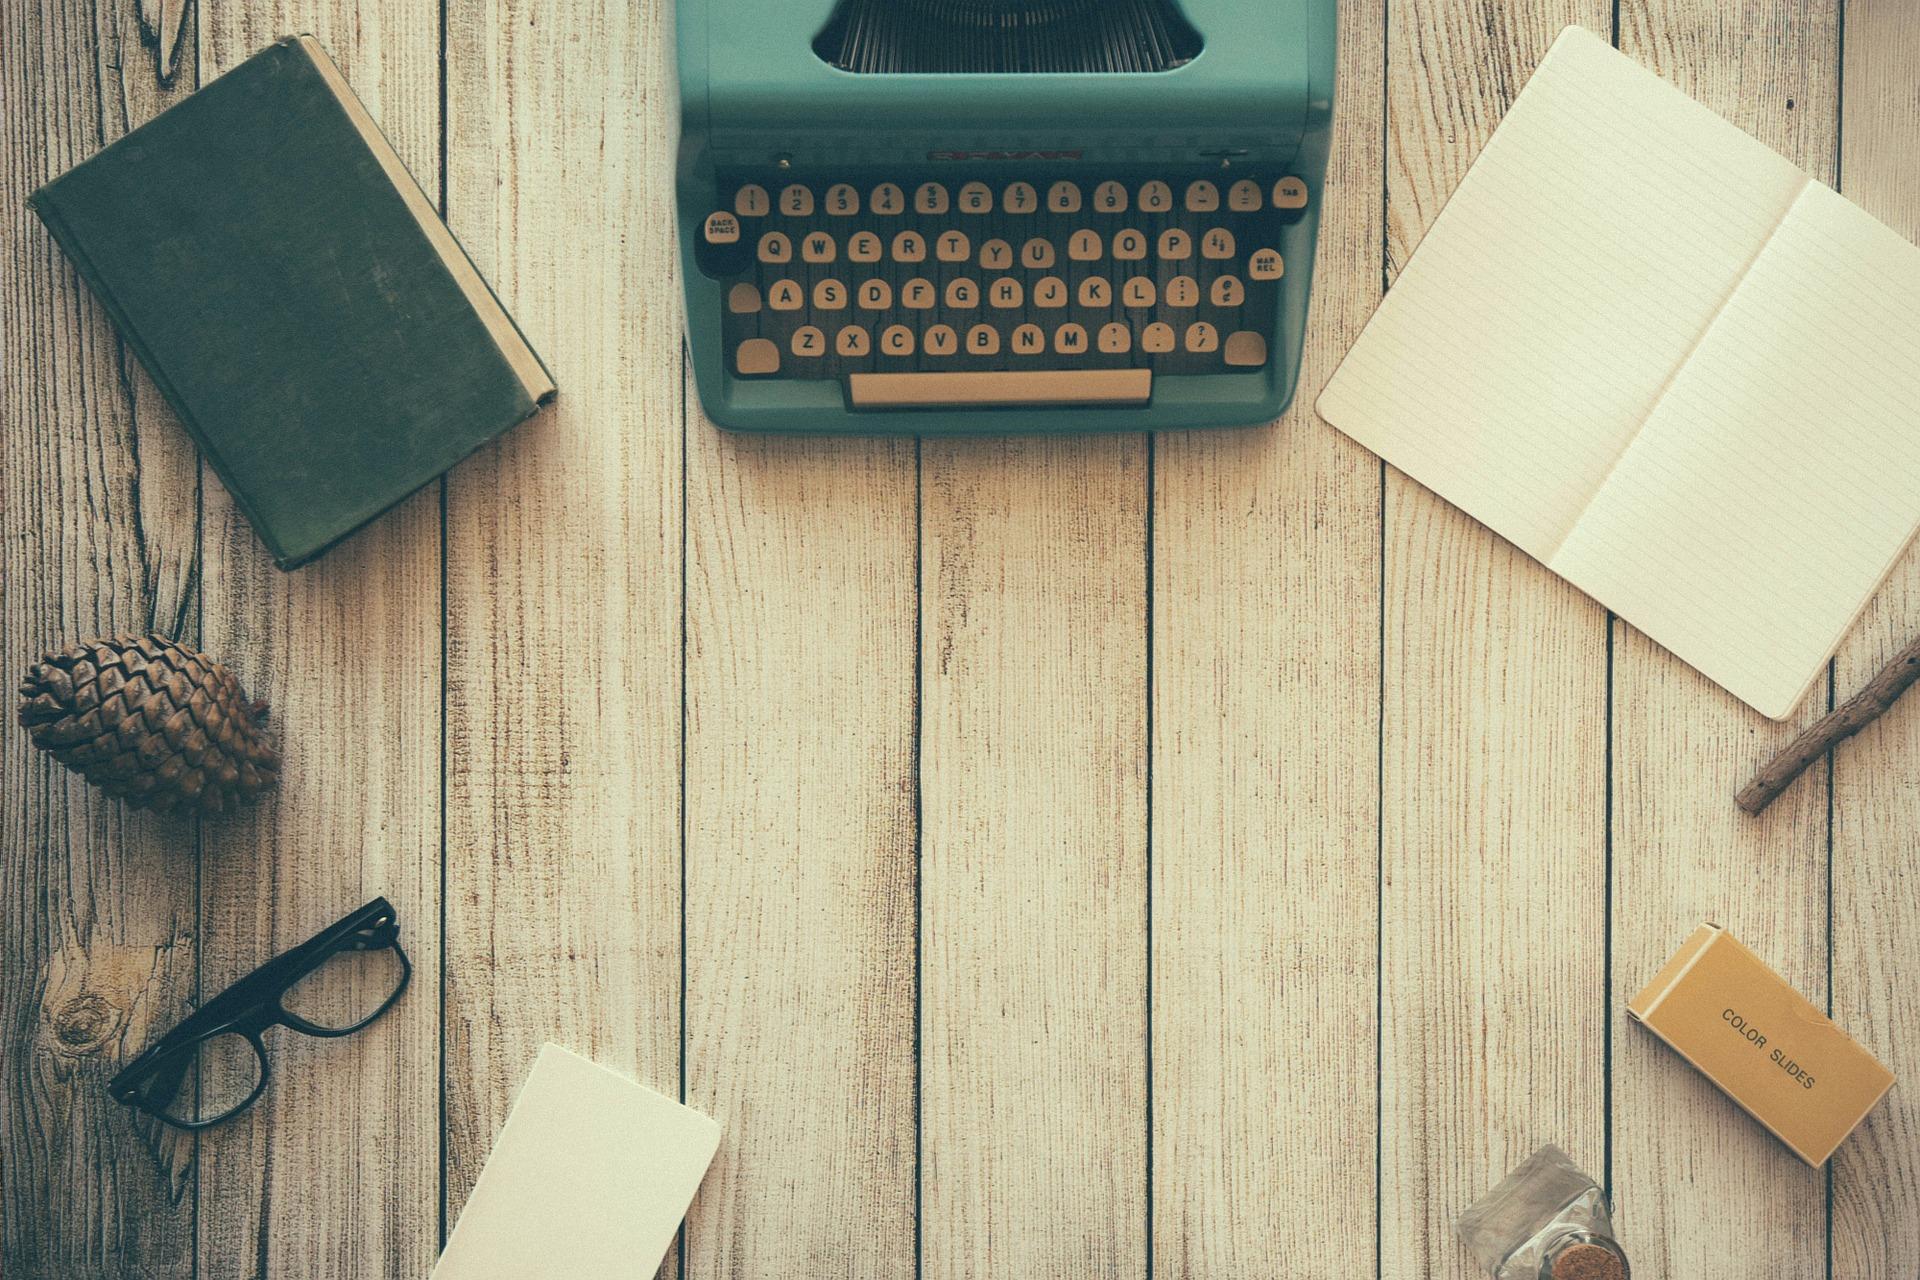 redactor web, redactor blog, redactor online, freelance, busco redactor